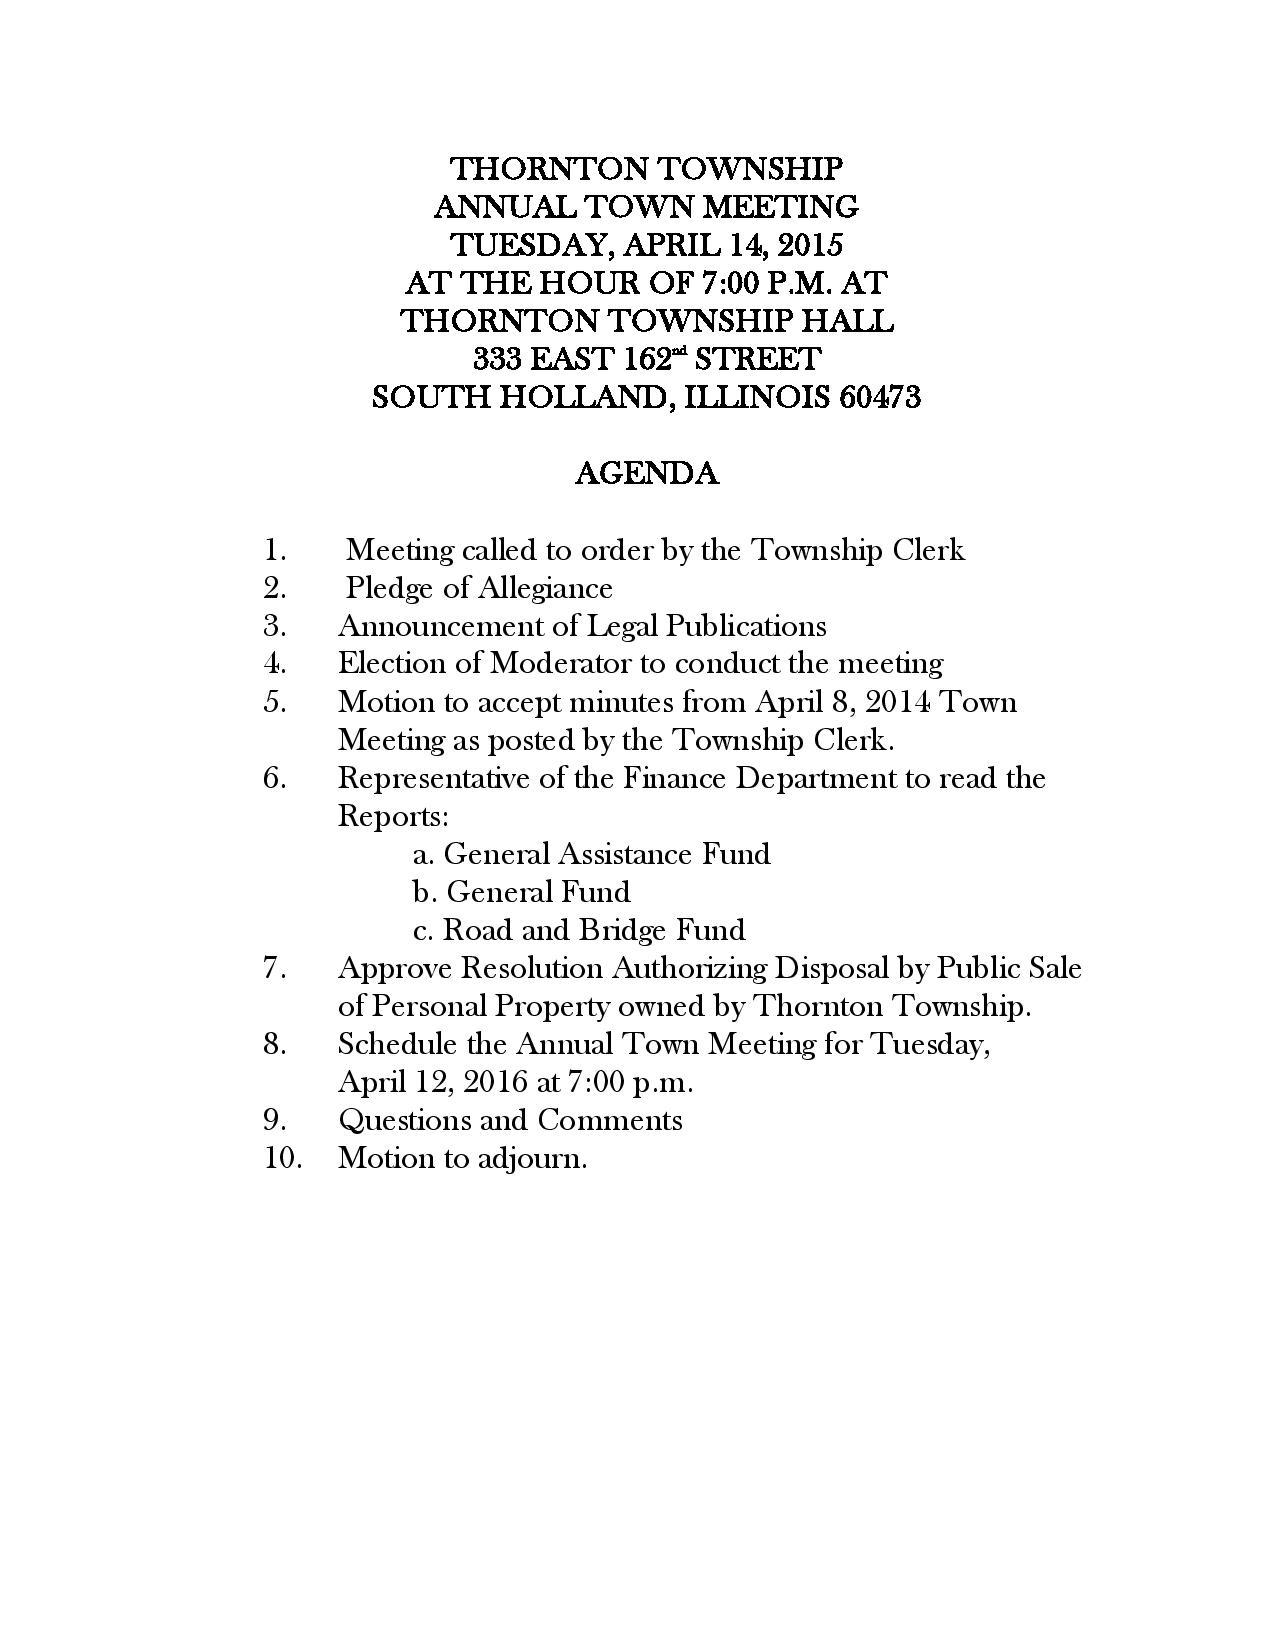 Thornton Township Annial Town Meeting - Tuesday, April 14th - Public Agenda-page-001